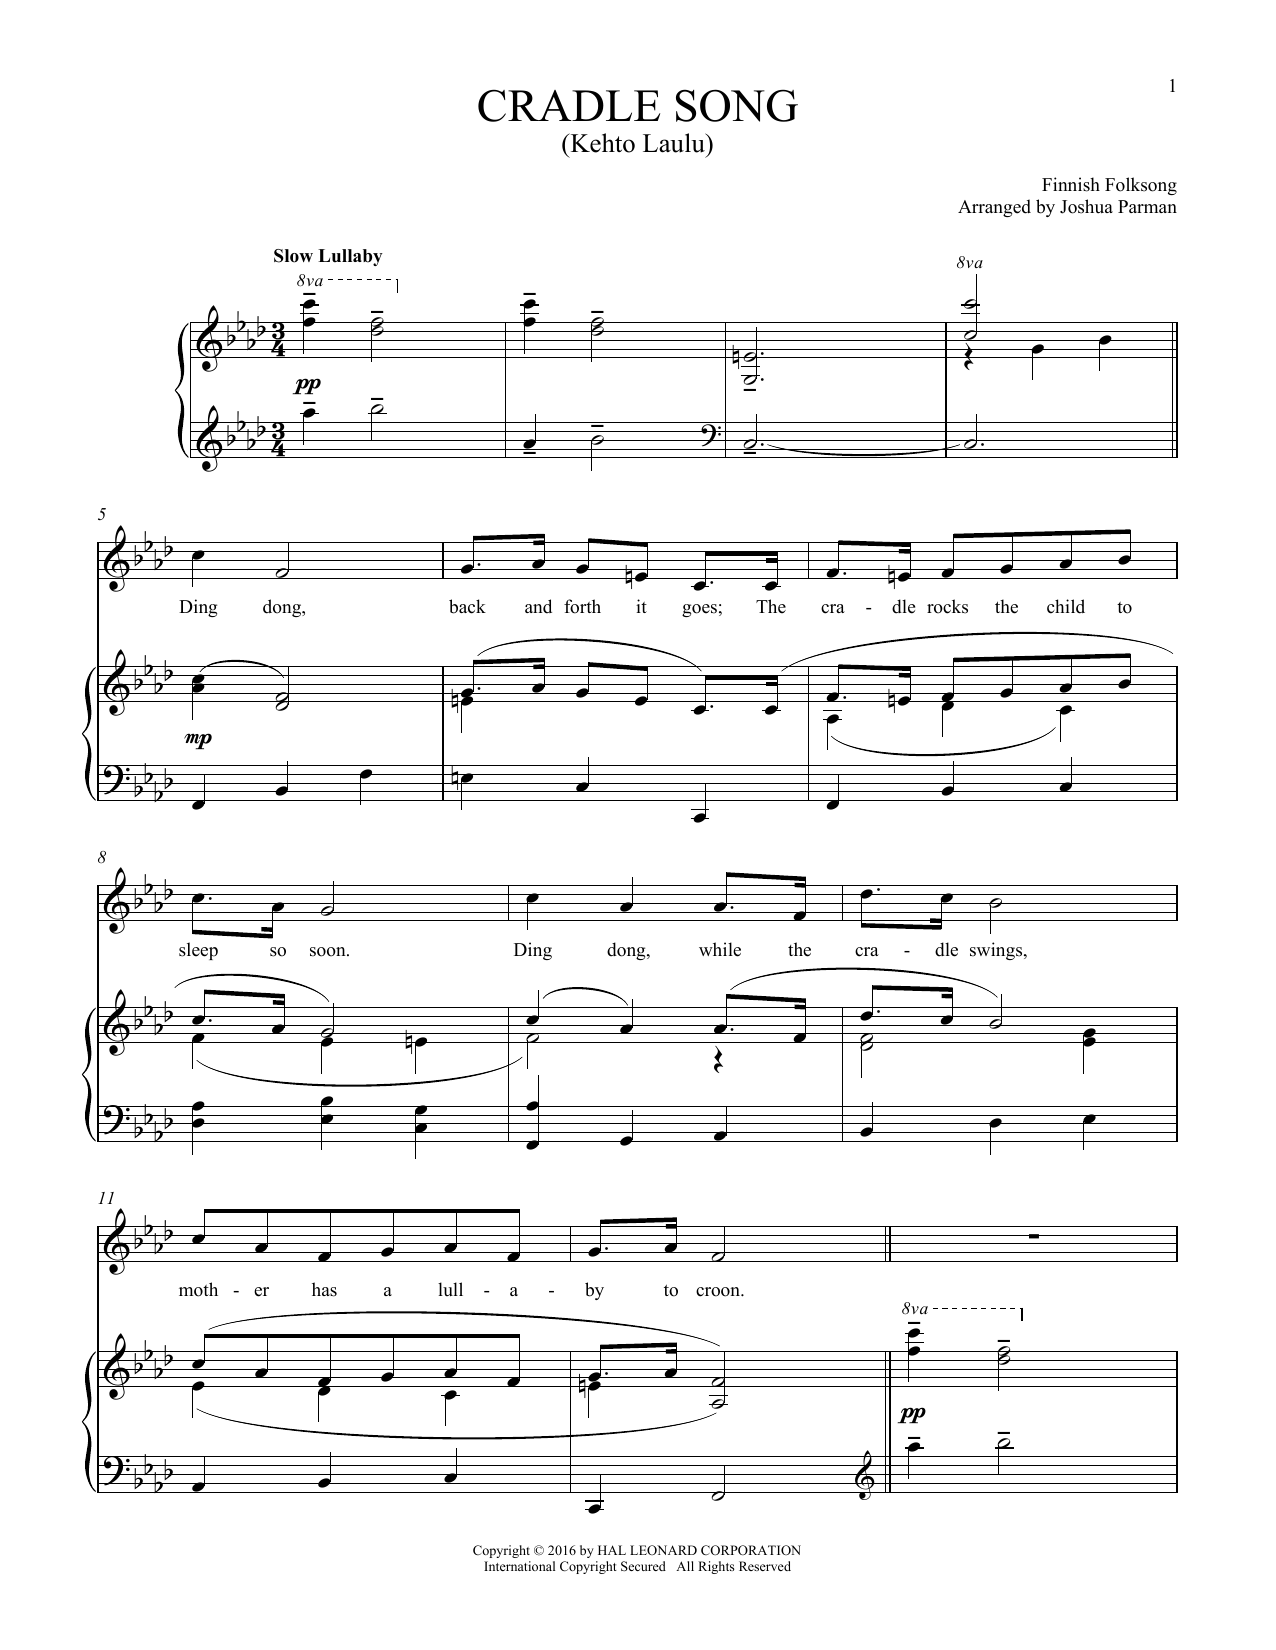 Traditional Folksong Kehto Laula (Cradle Song) sheet music notes and chords. Download Printable PDF.